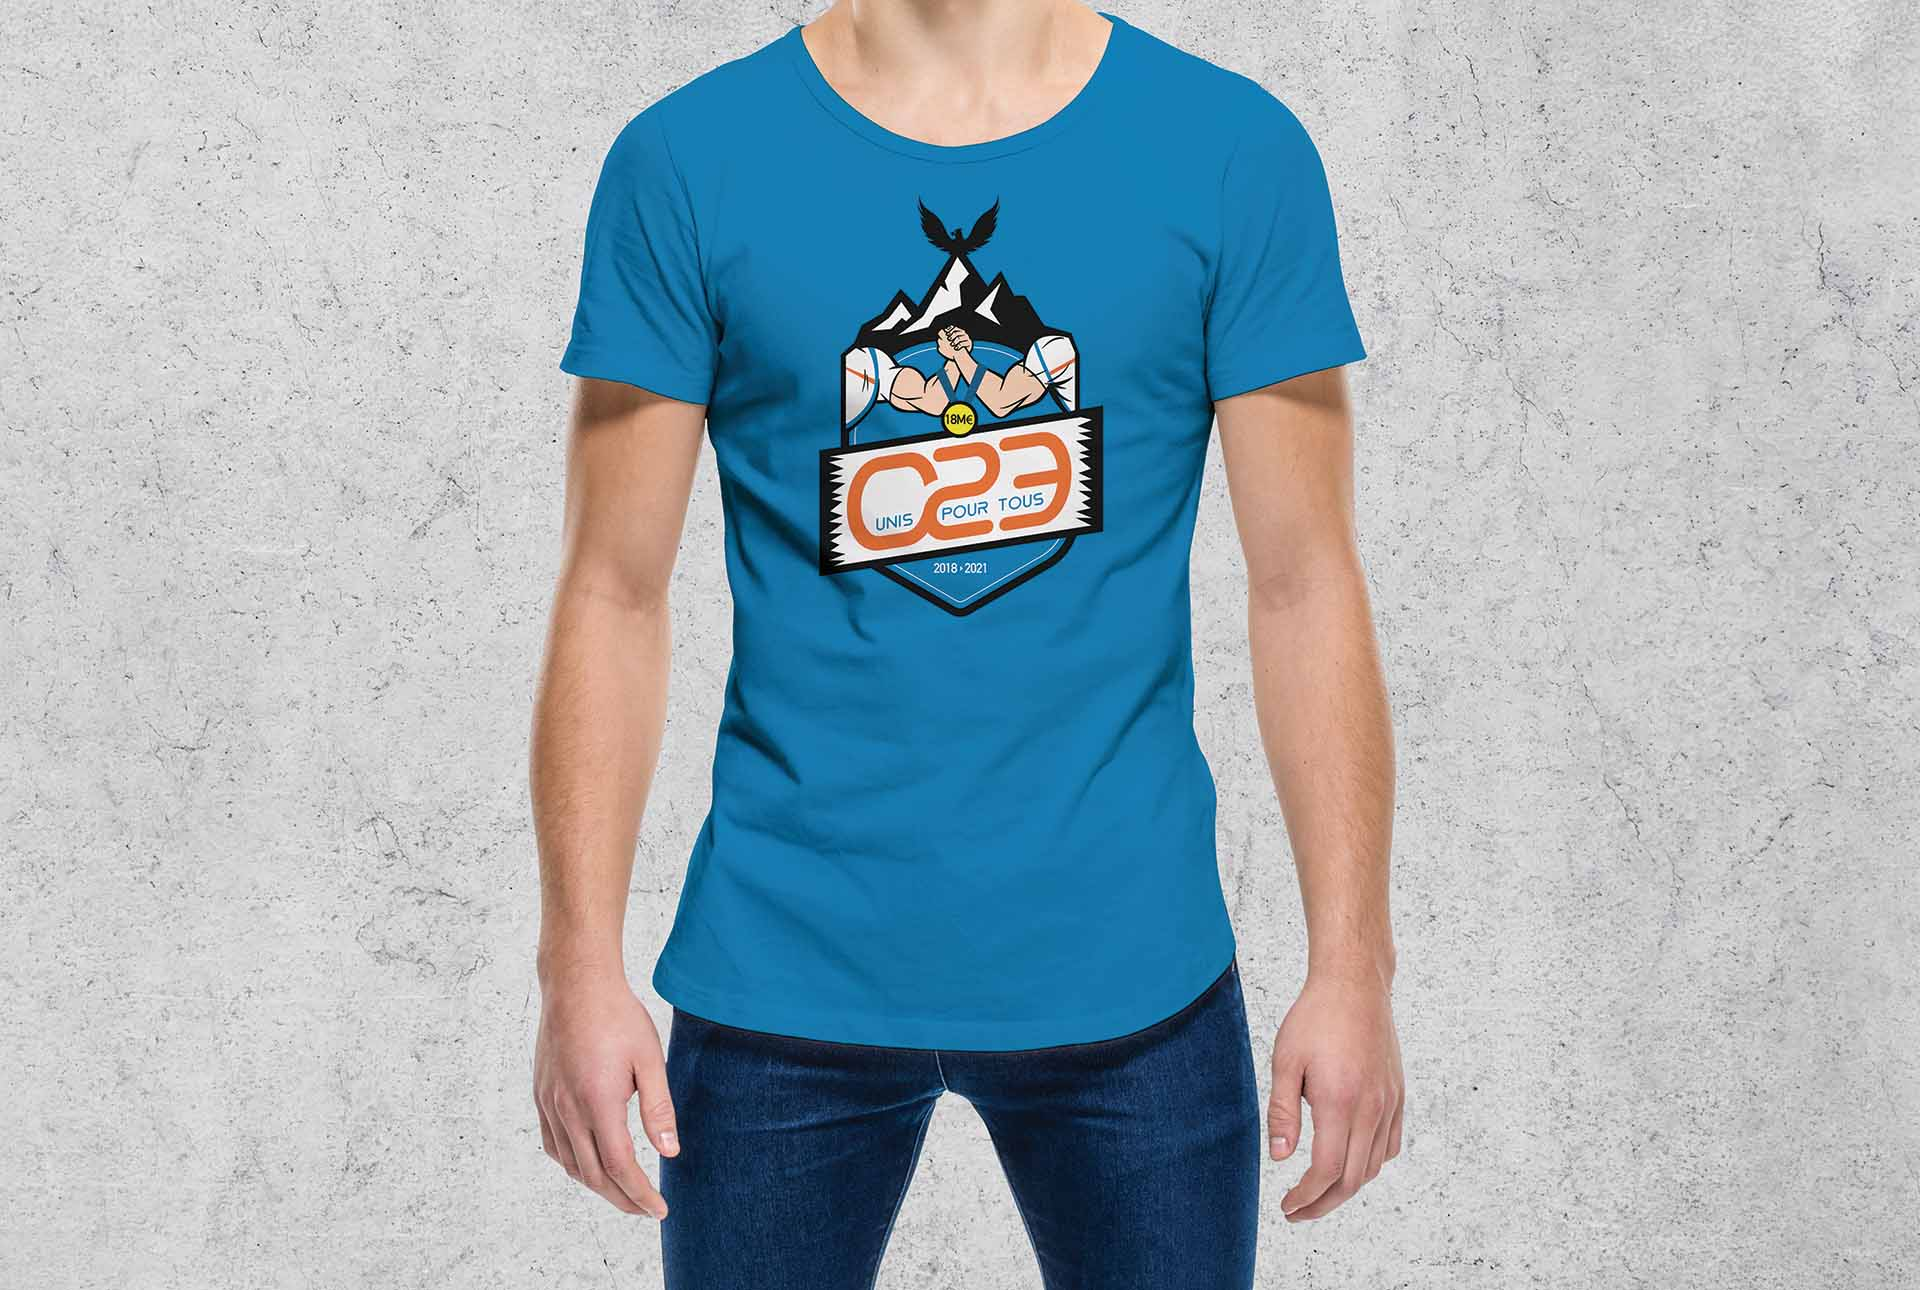 decathlon creation tee shirt graphiste grenoble